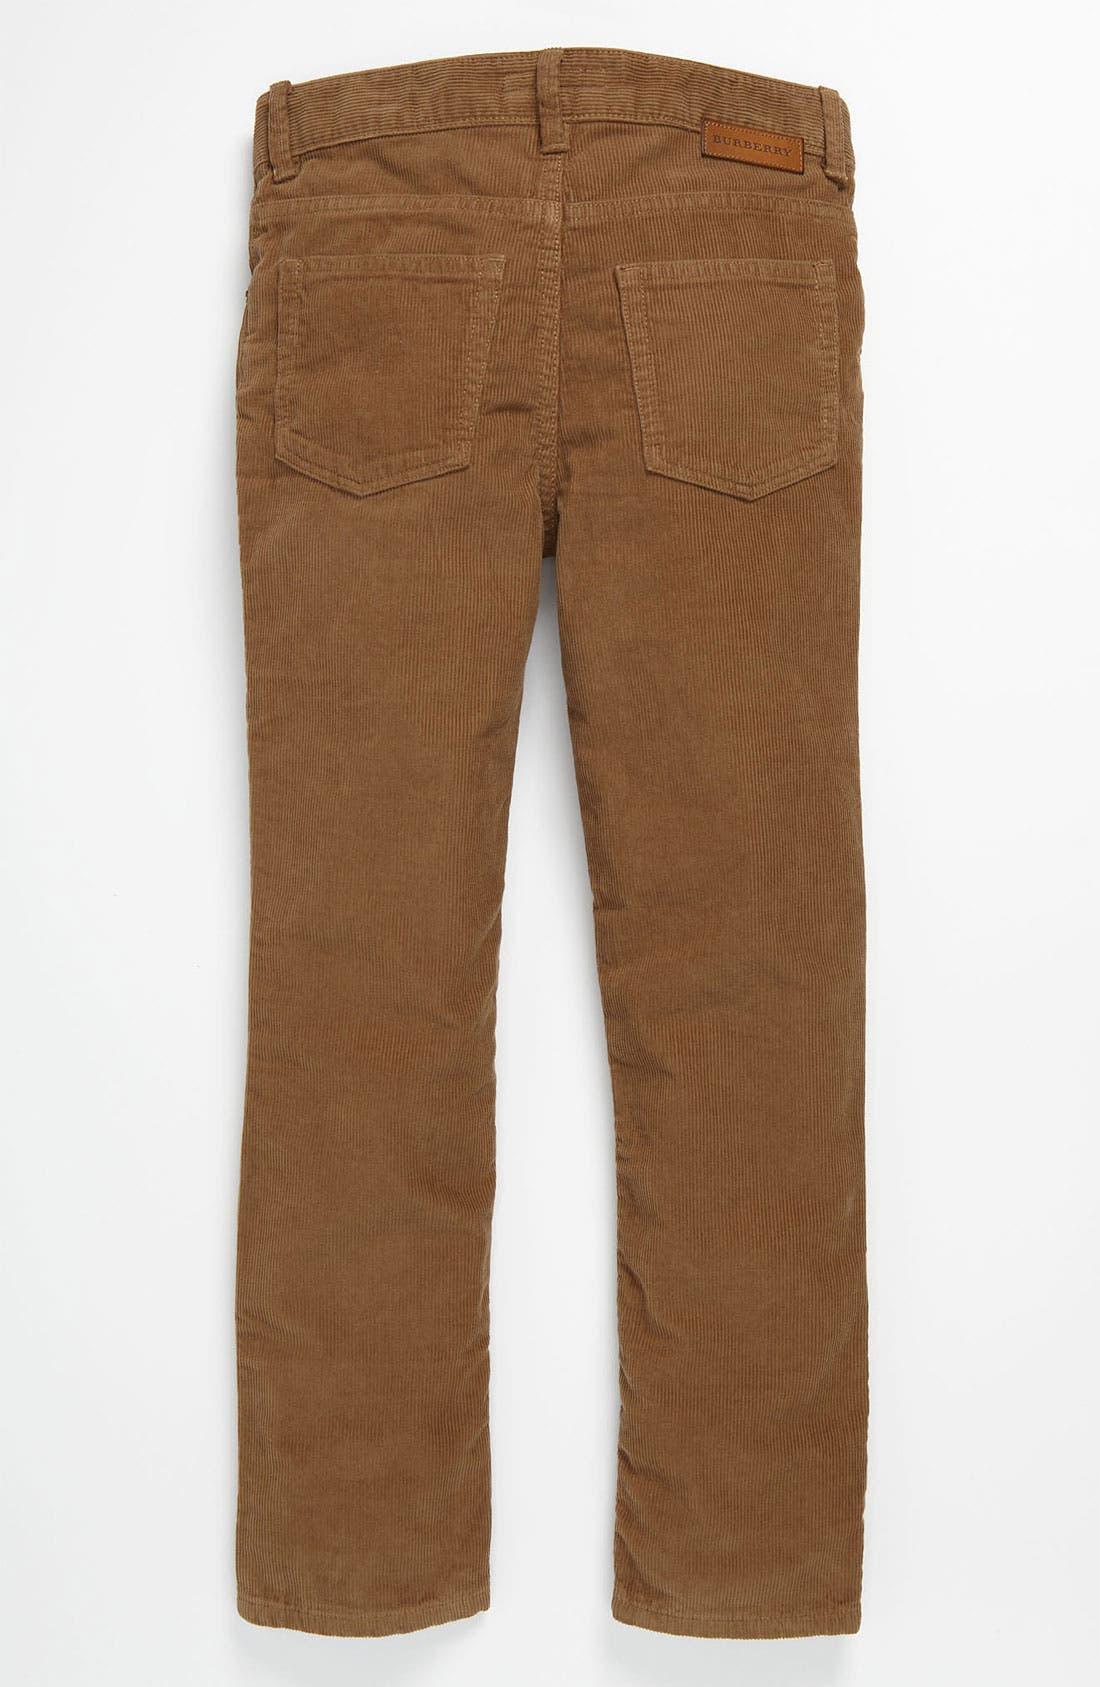 Alternate Image 1 Selected - Burberry Corduroy Pants (Little Boys)